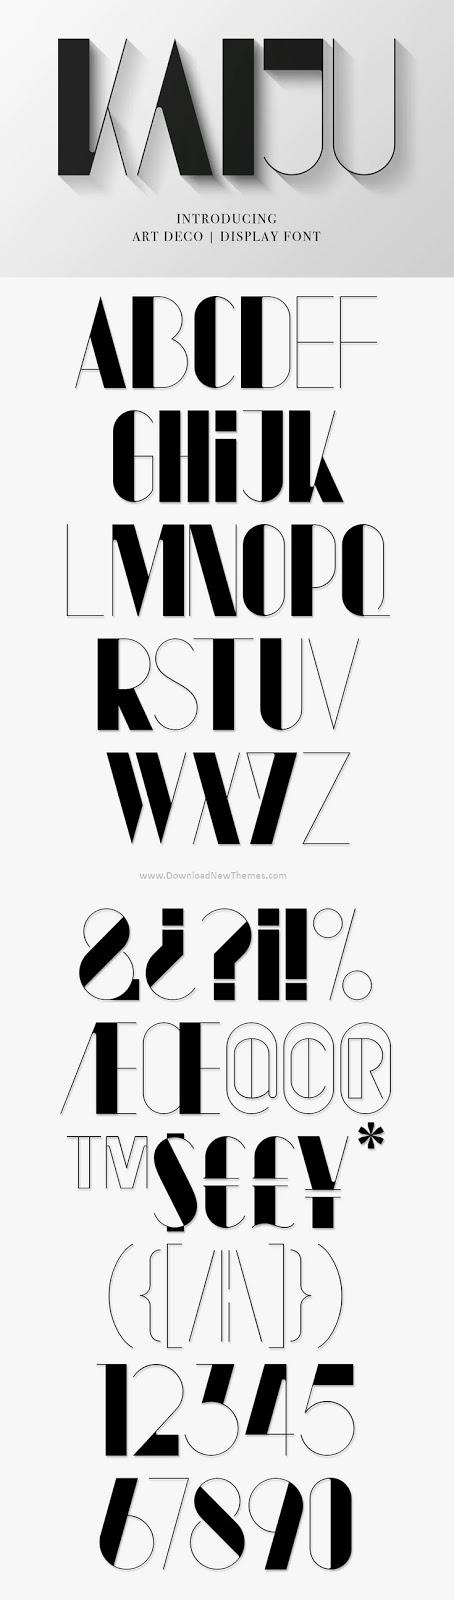 Free Modern Art Deco Typeface Font